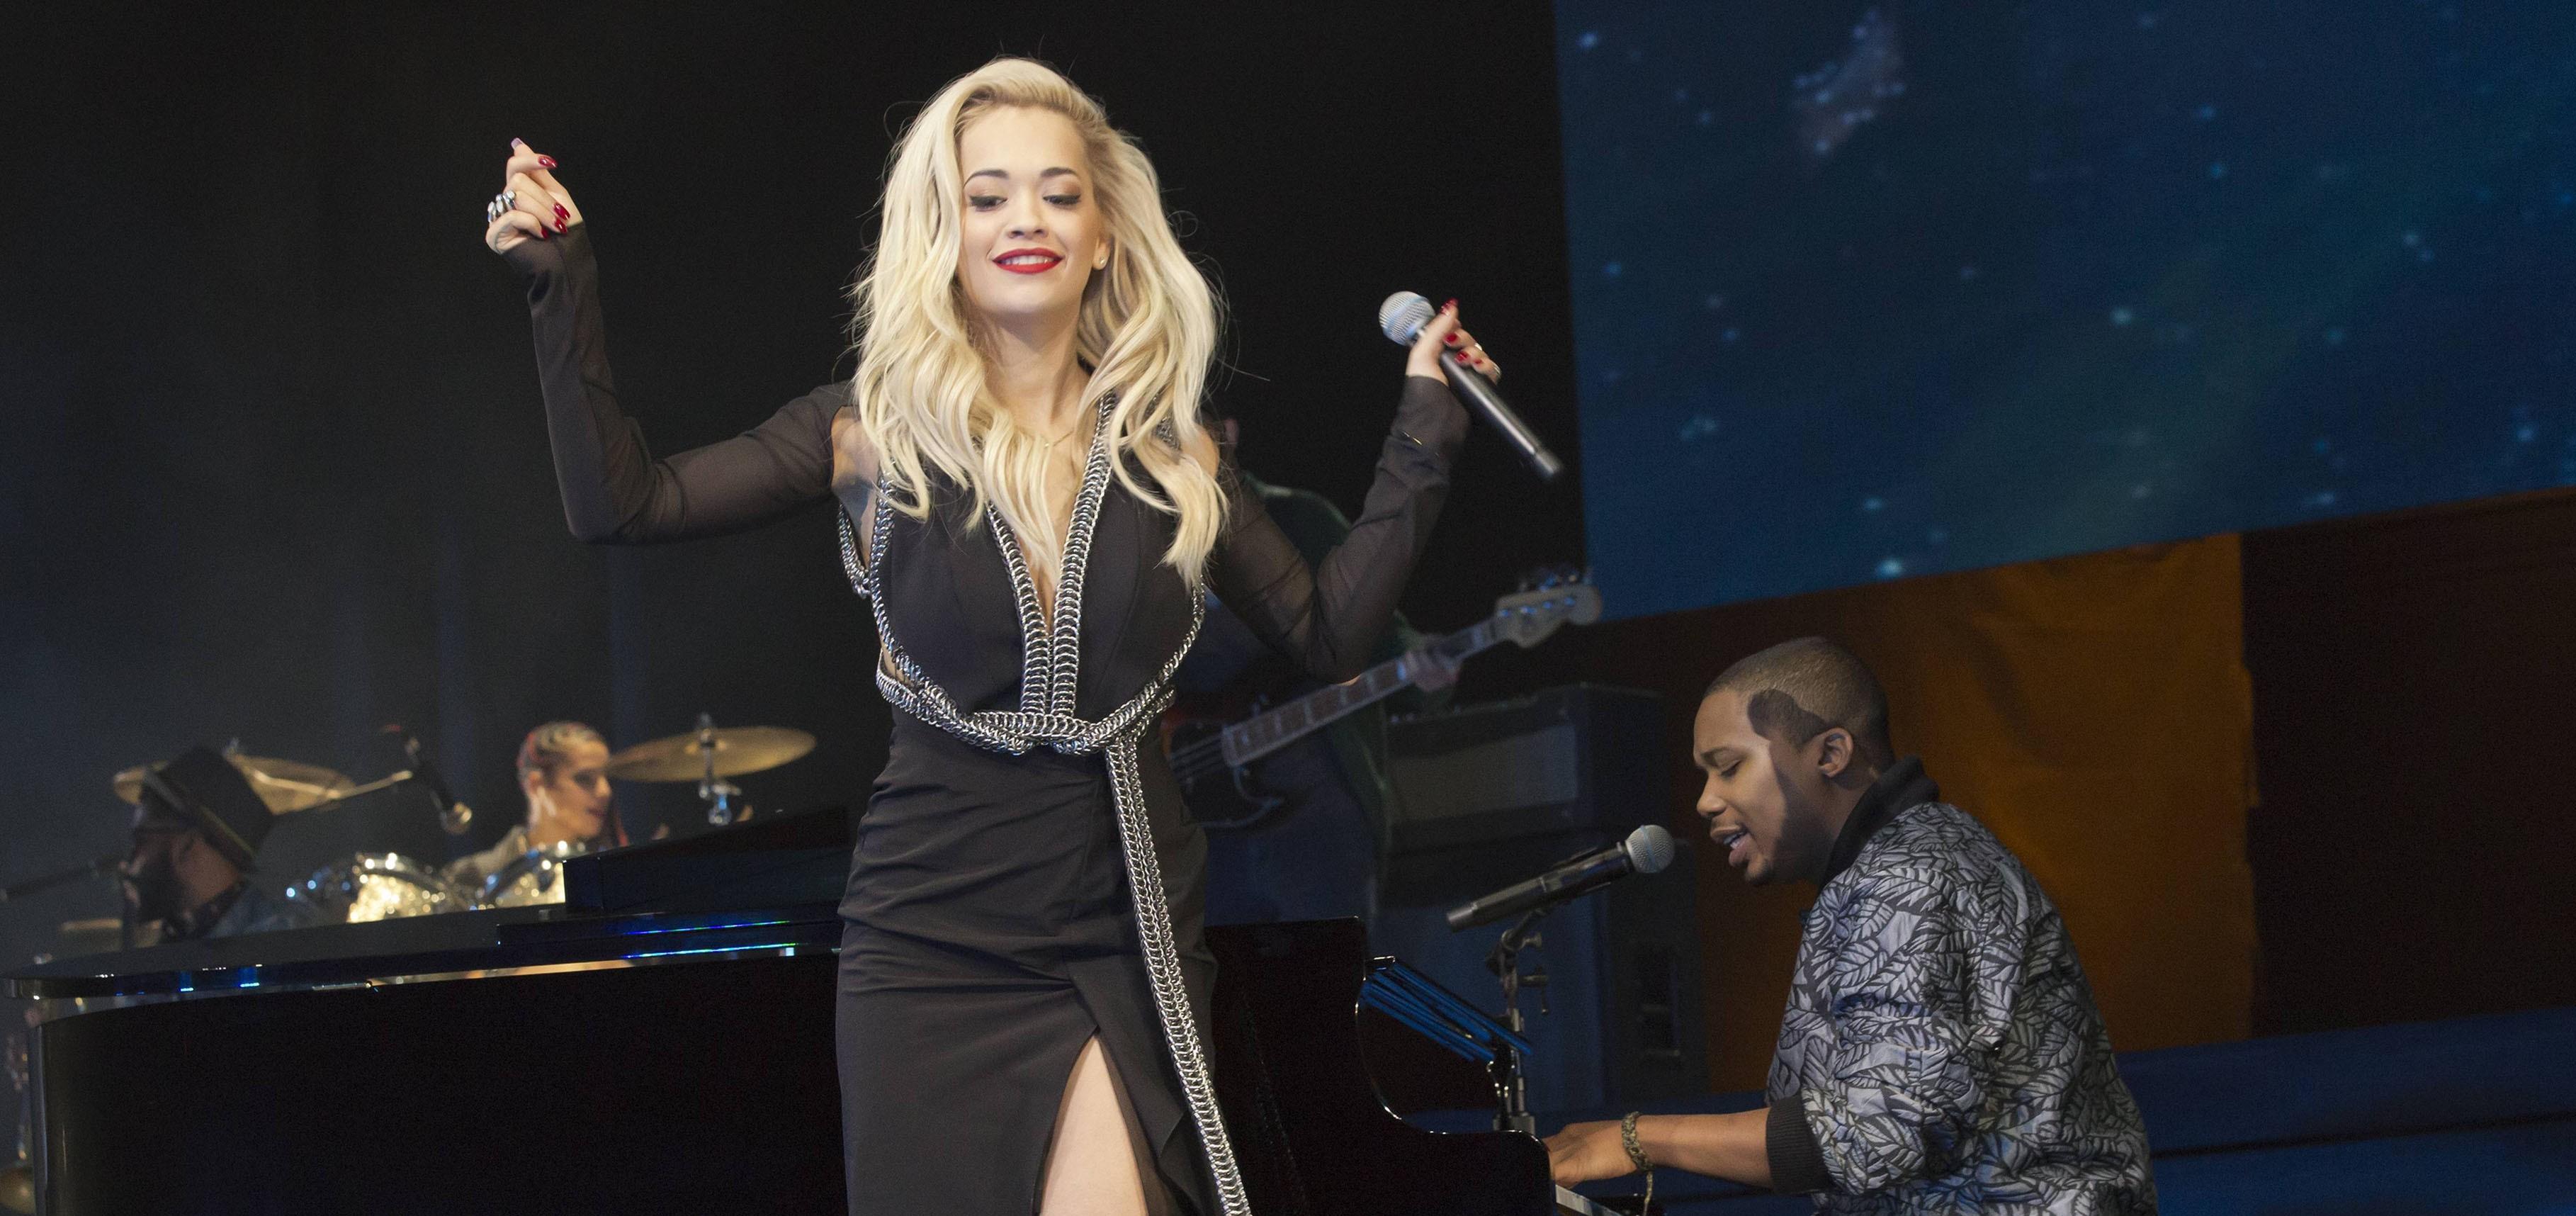 Charles Hamilton and Rita Ora Perform 'New York Raining' on 'Late Night'